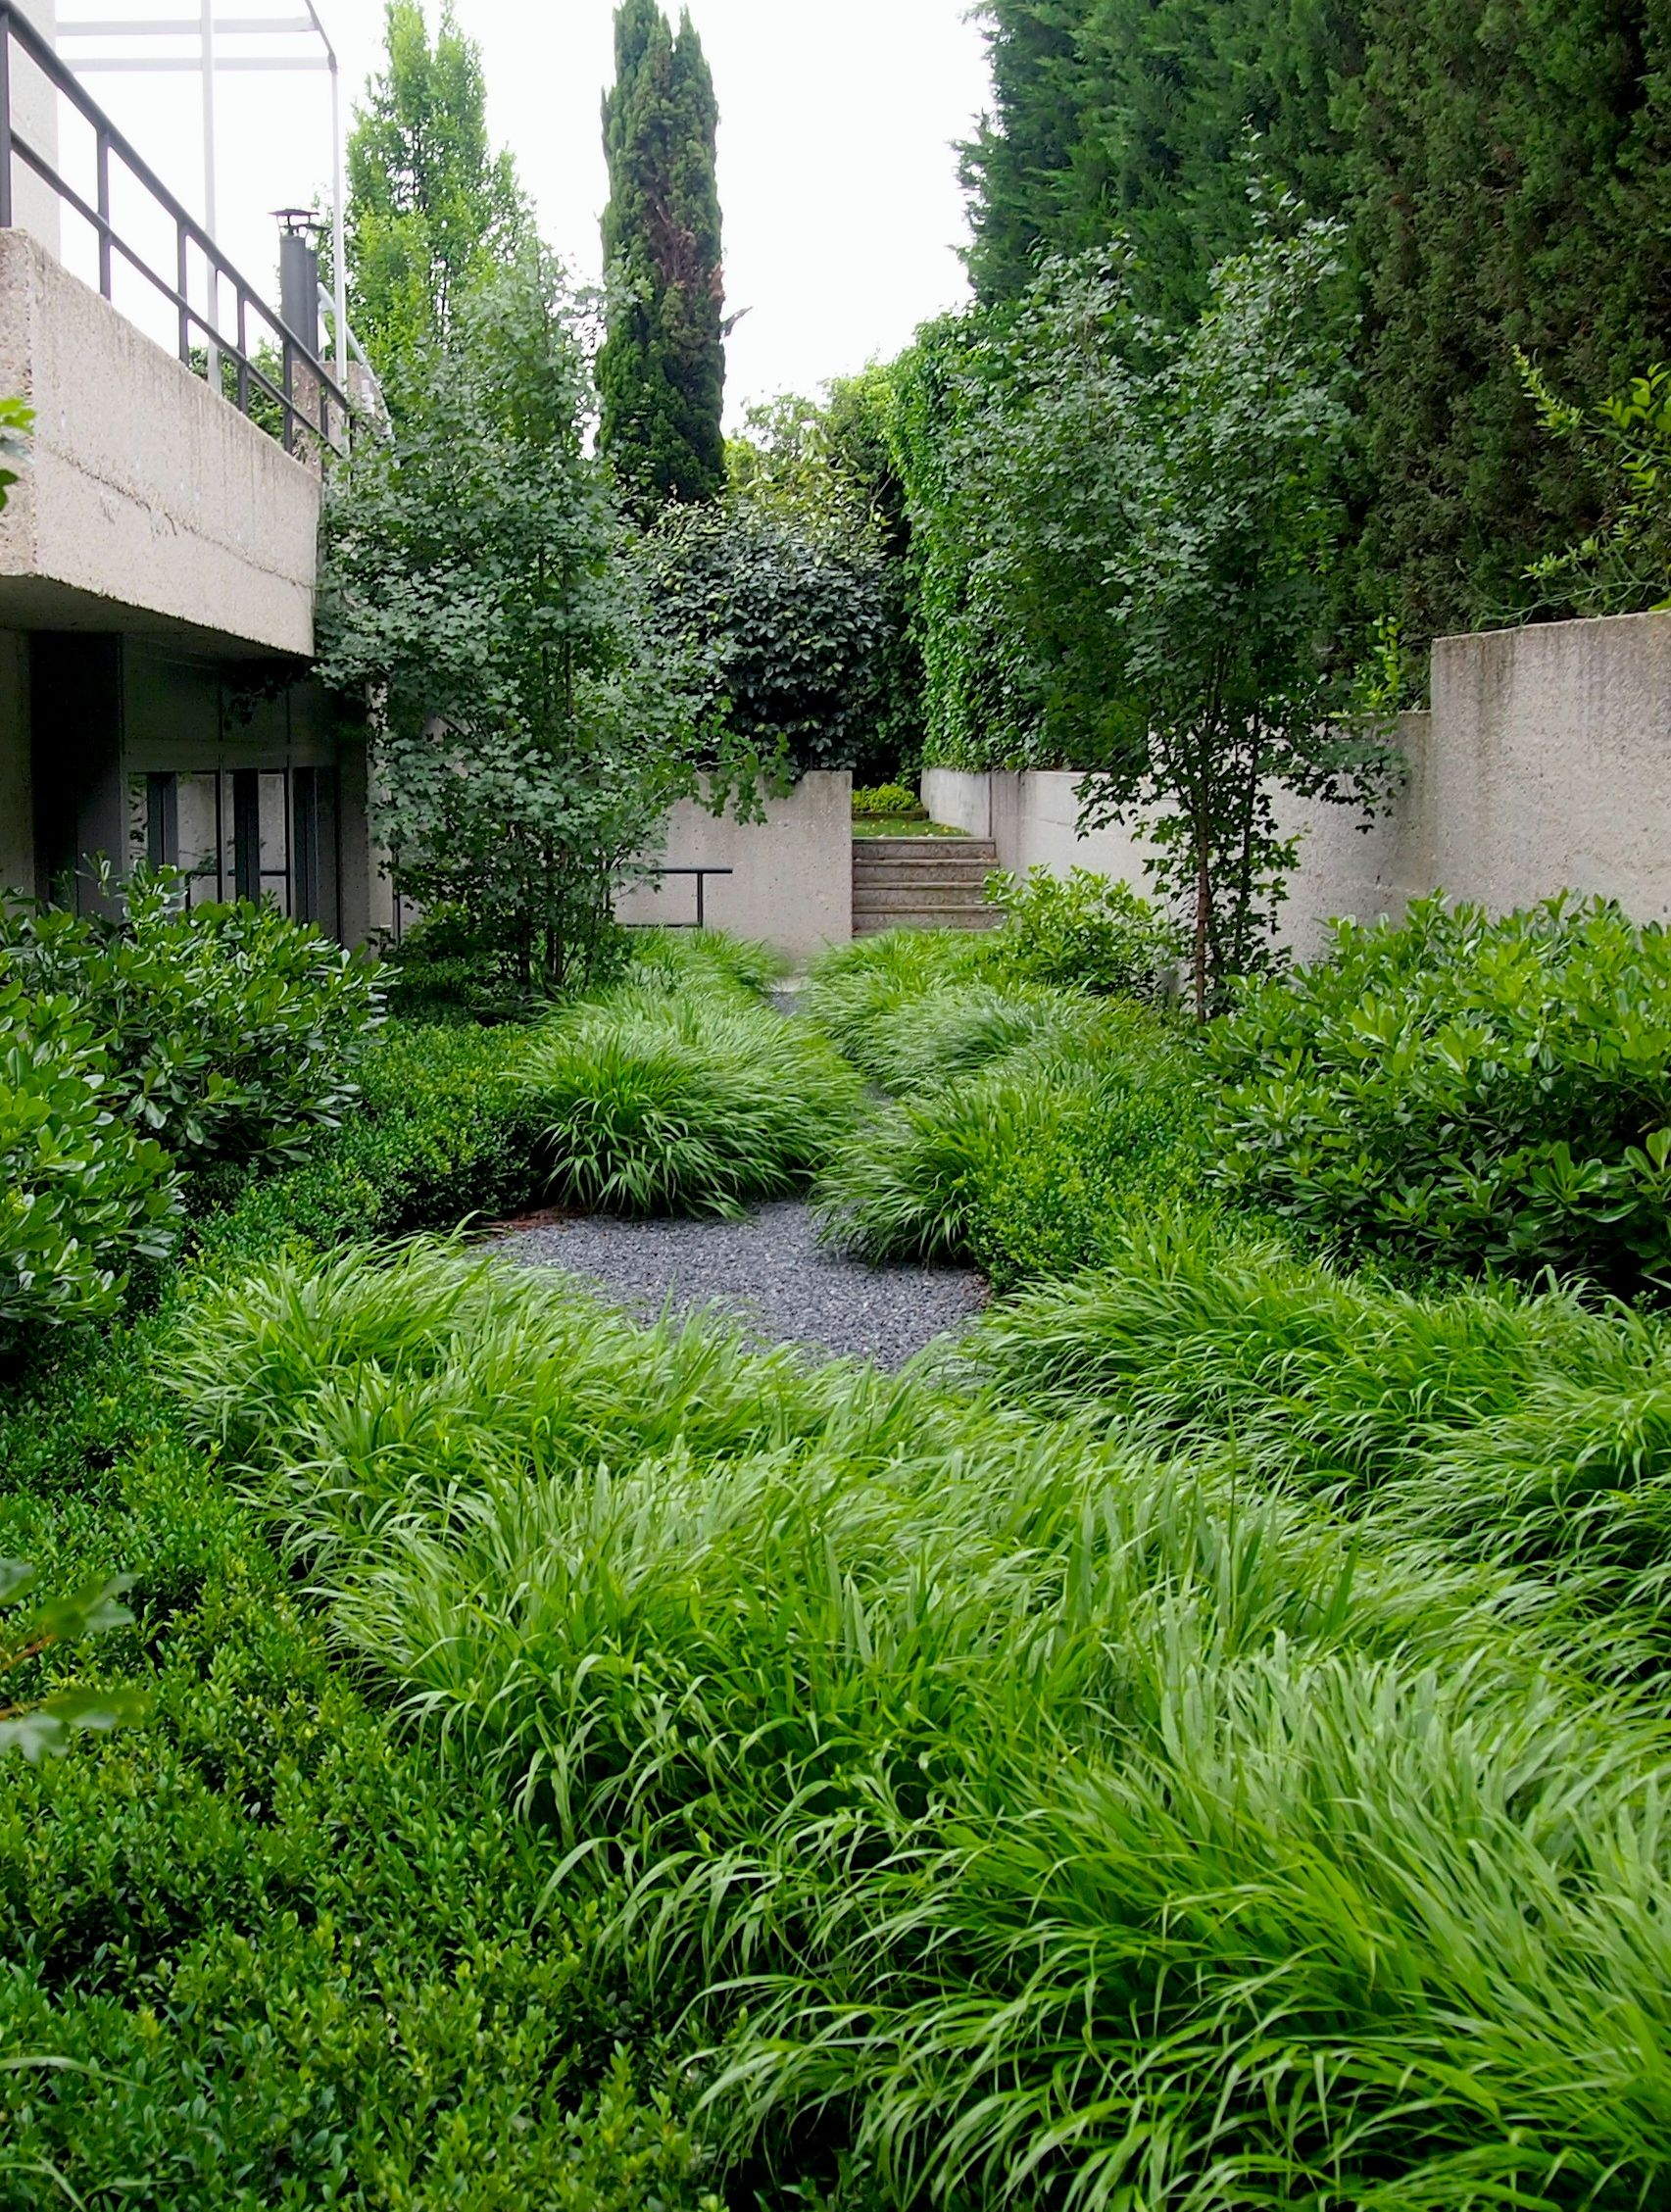 Hakonechloa macra jard n aravaca paisajismo miguel for Paisajismo jardines